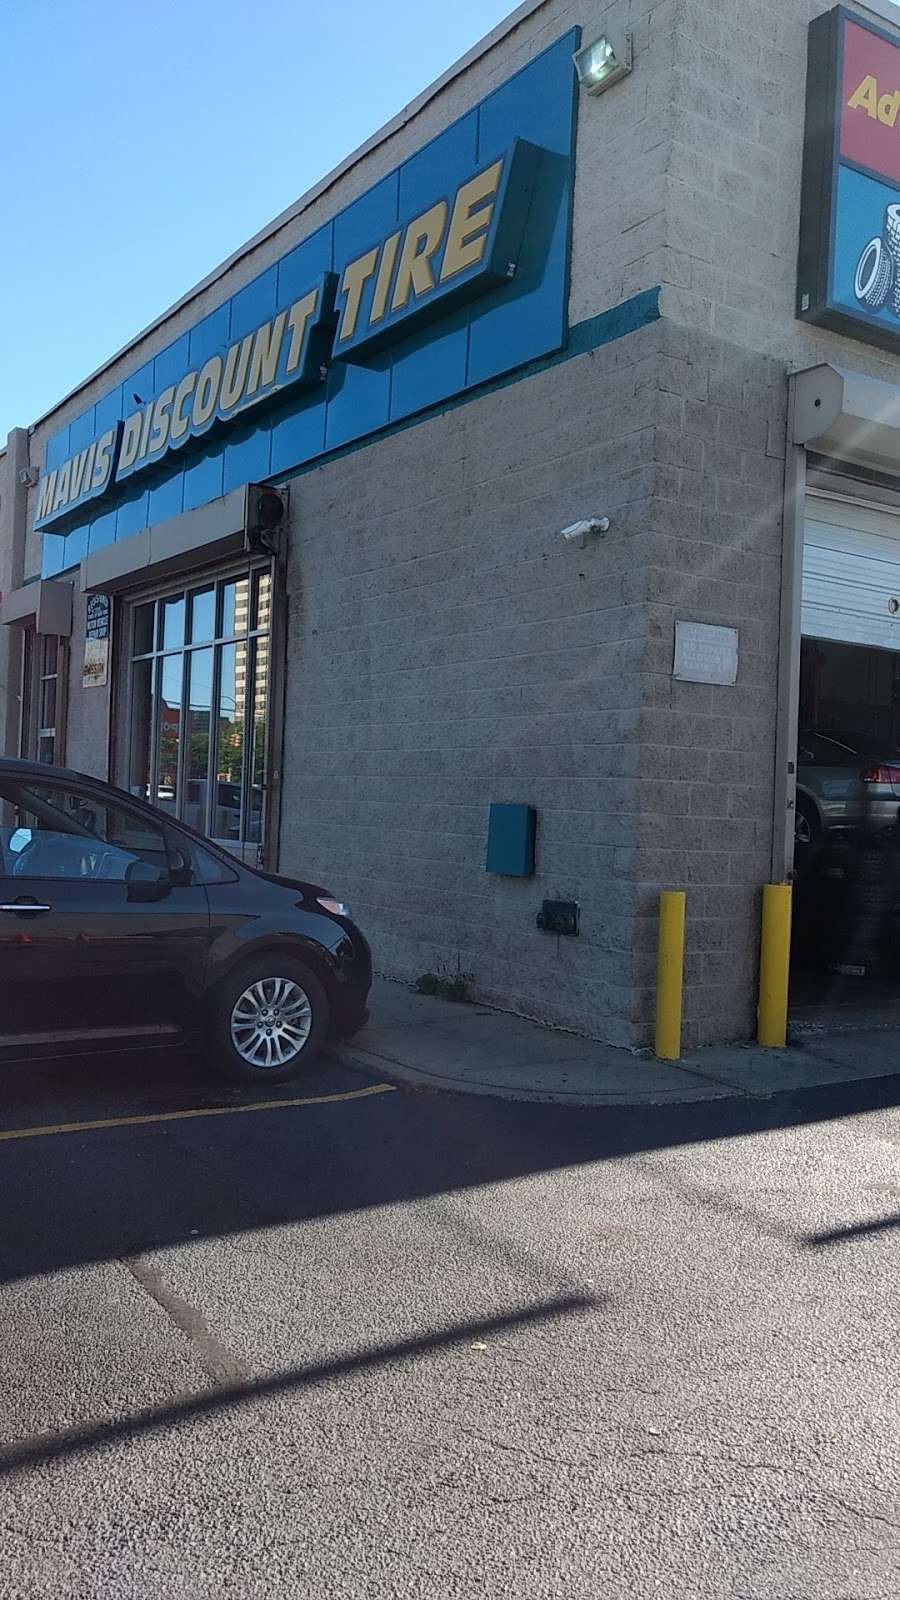 Mavis Discount Tire - car repair  | Photo 8 of 10 | Address: 832 Pennsylvania Ave, Brooklyn, NY 11207, USA | Phone: (718) 307-6771